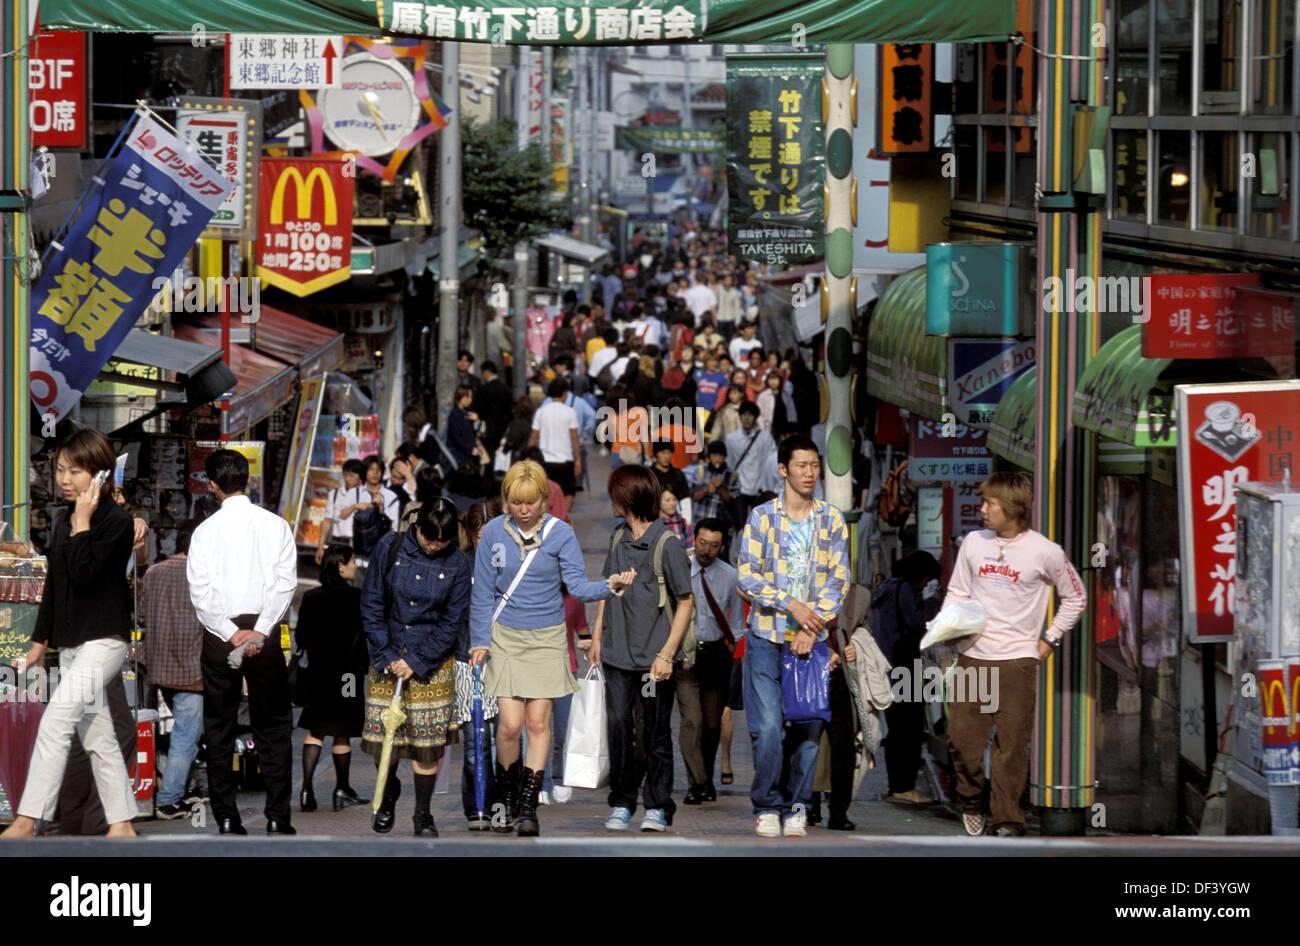 Harajuku youth culture and fashion area, Tokyo, Japan - Stock Image